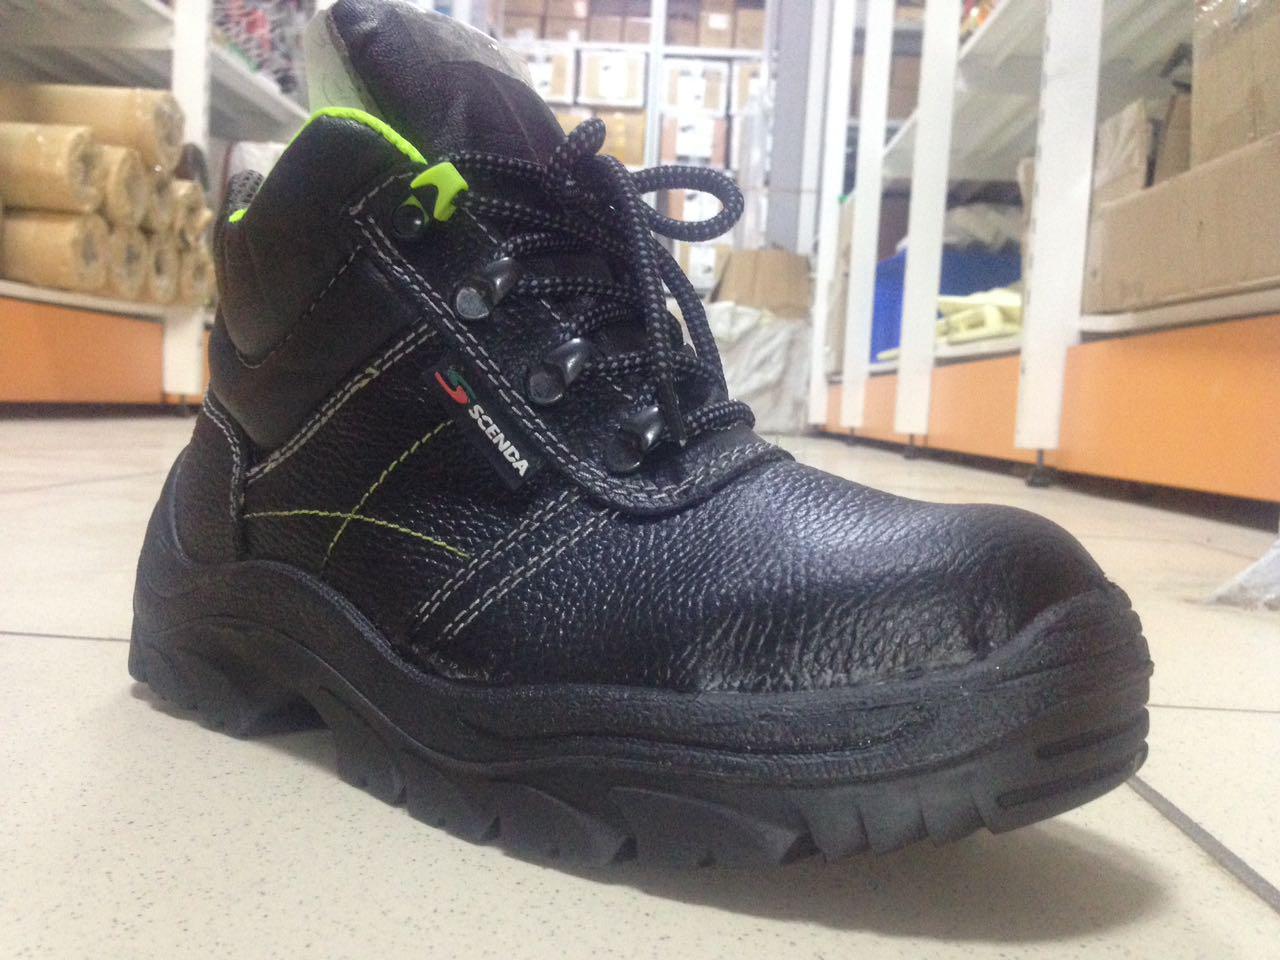 Ботинки кожаные НЕОН Basic ПУ с МП (БОТ 541)